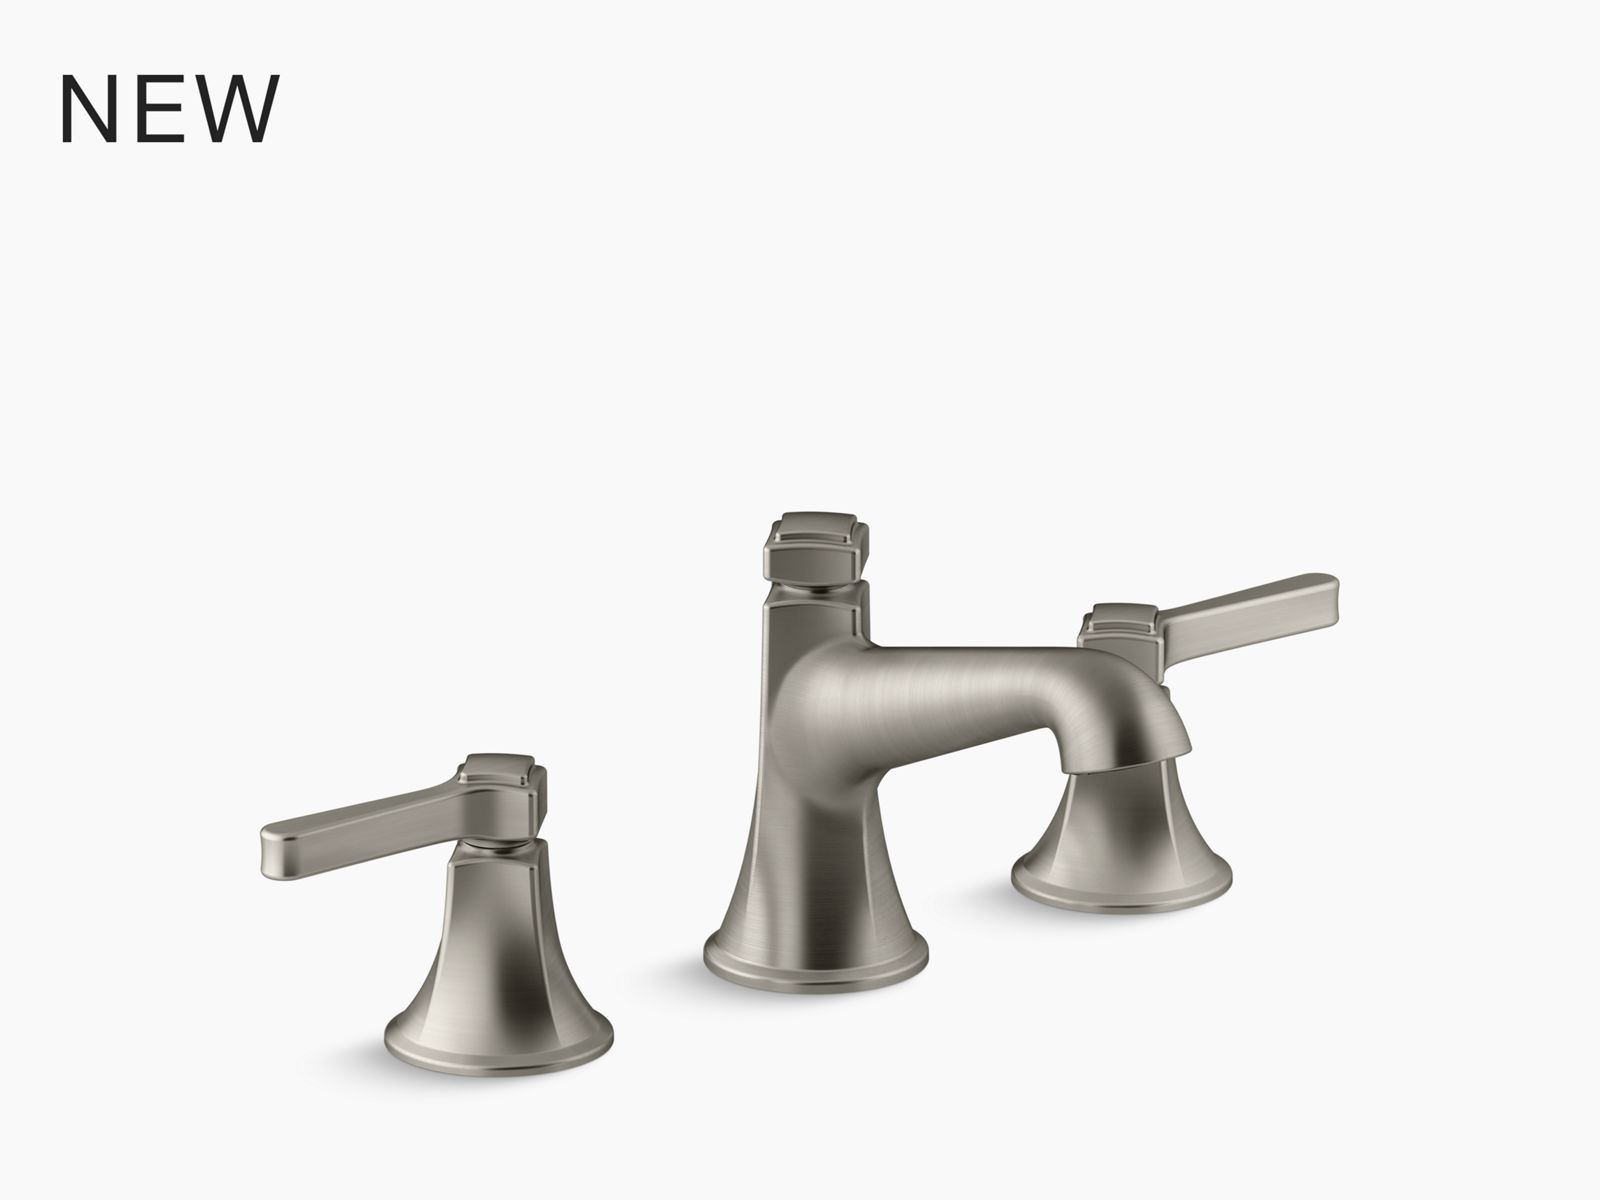 coralais deck mount bath faucet trim with 8 spout and lever handles valve not included